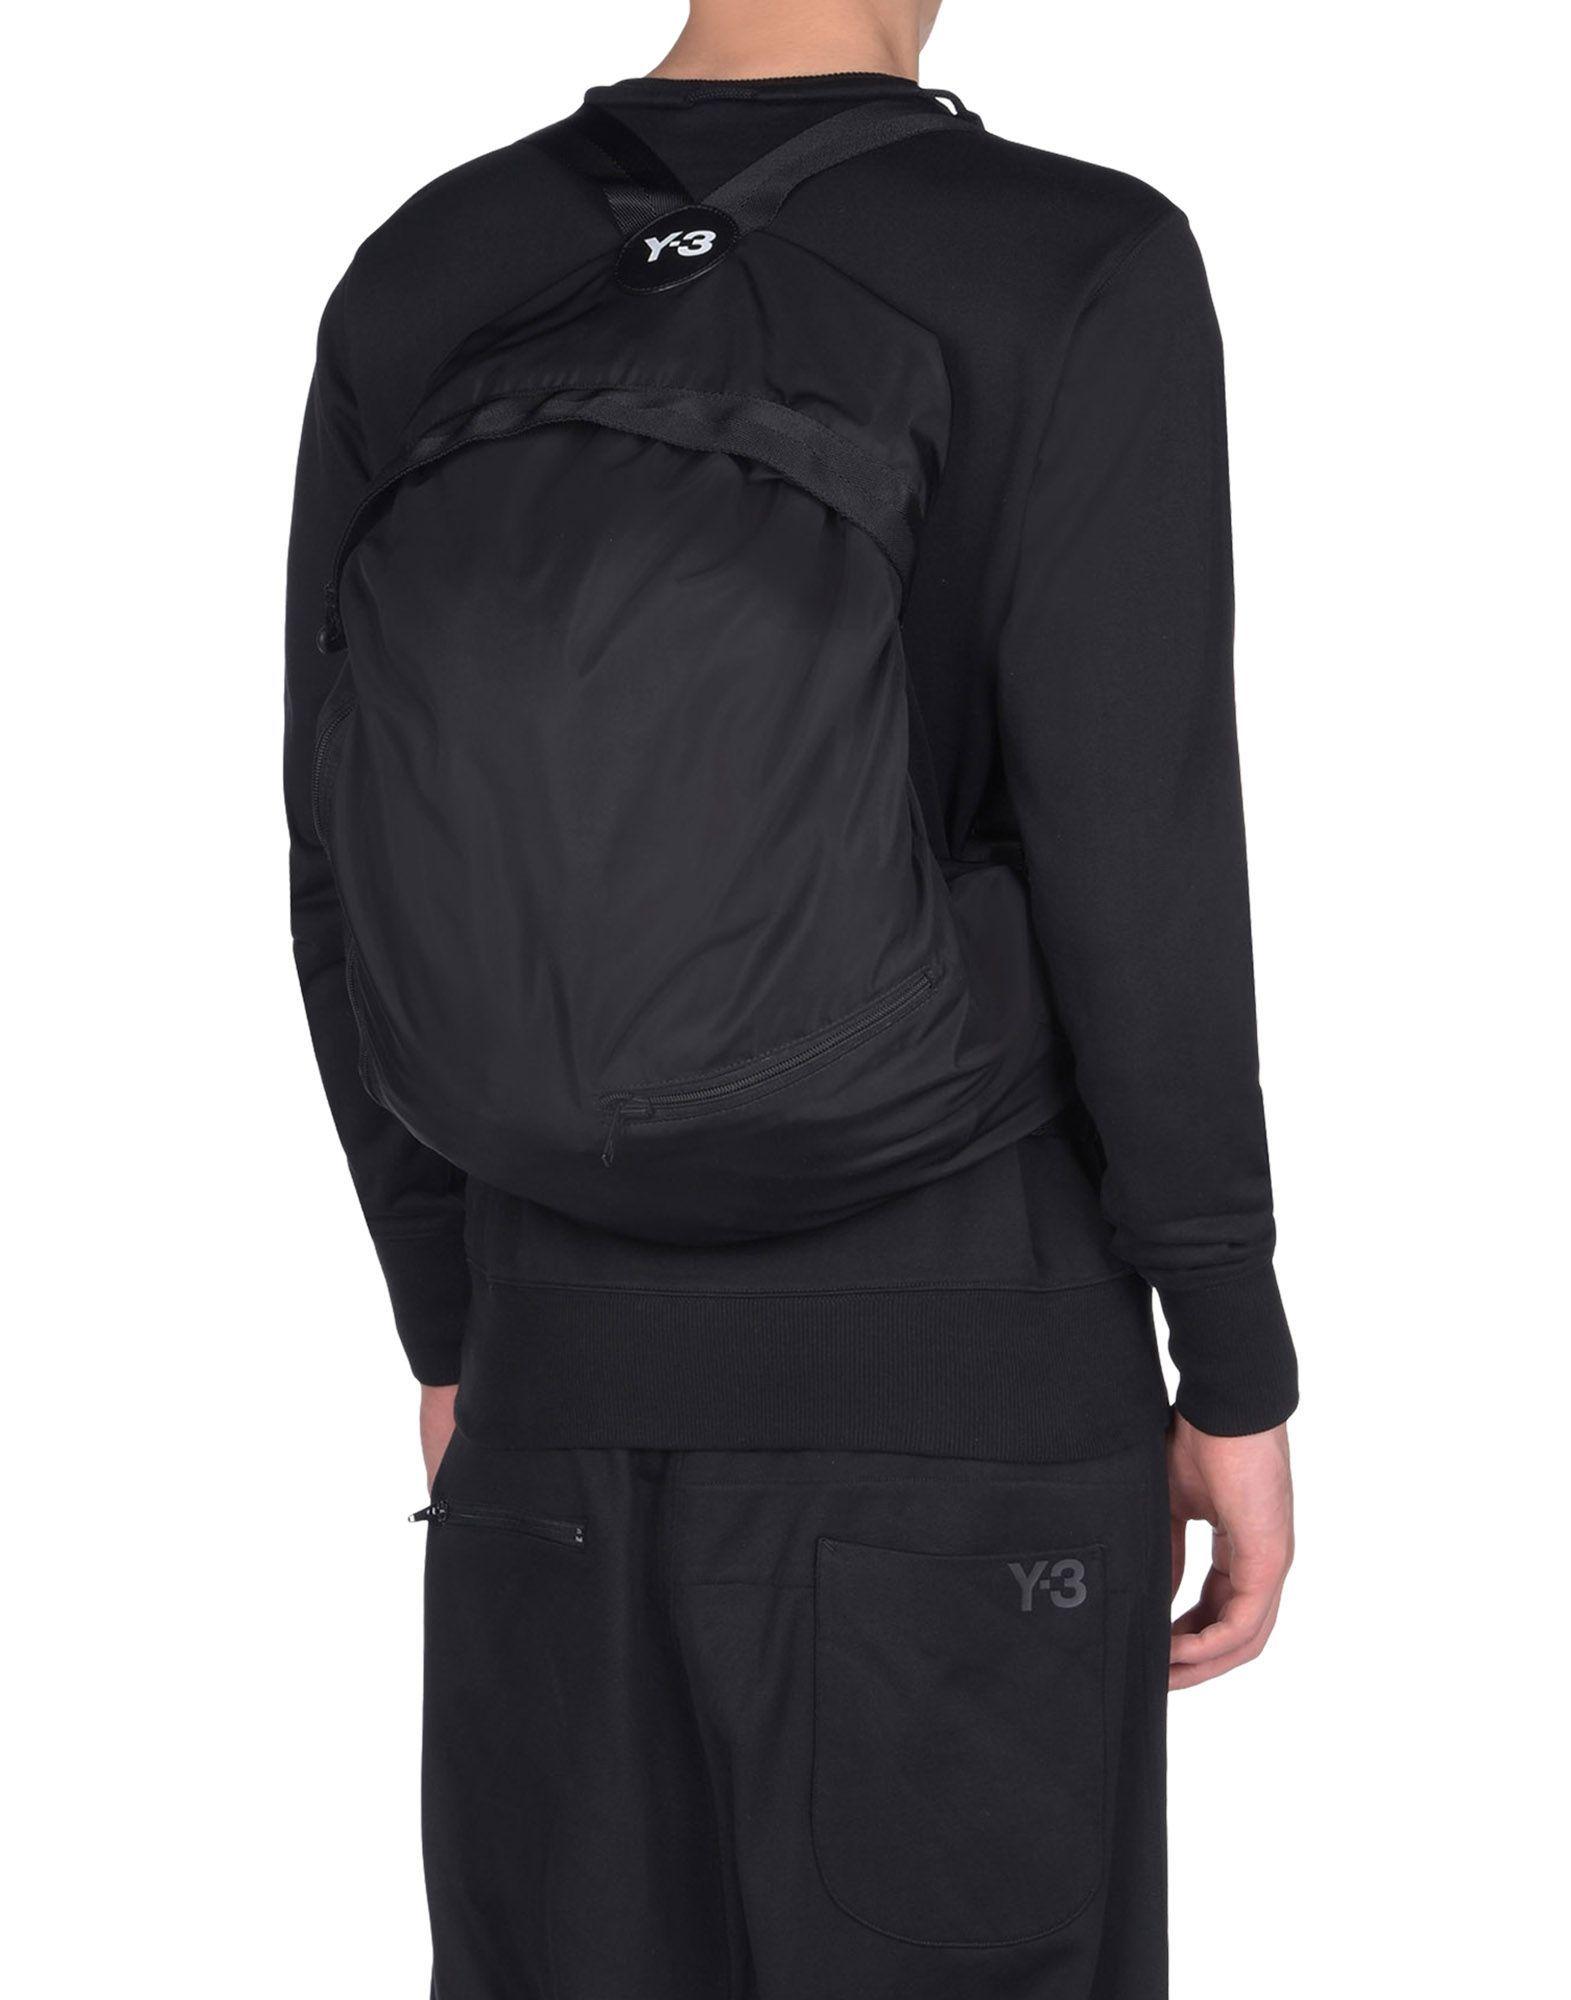 8b9666ab24 Y-3 PACKABLE BAG BAGS unisex Y-3 adidas